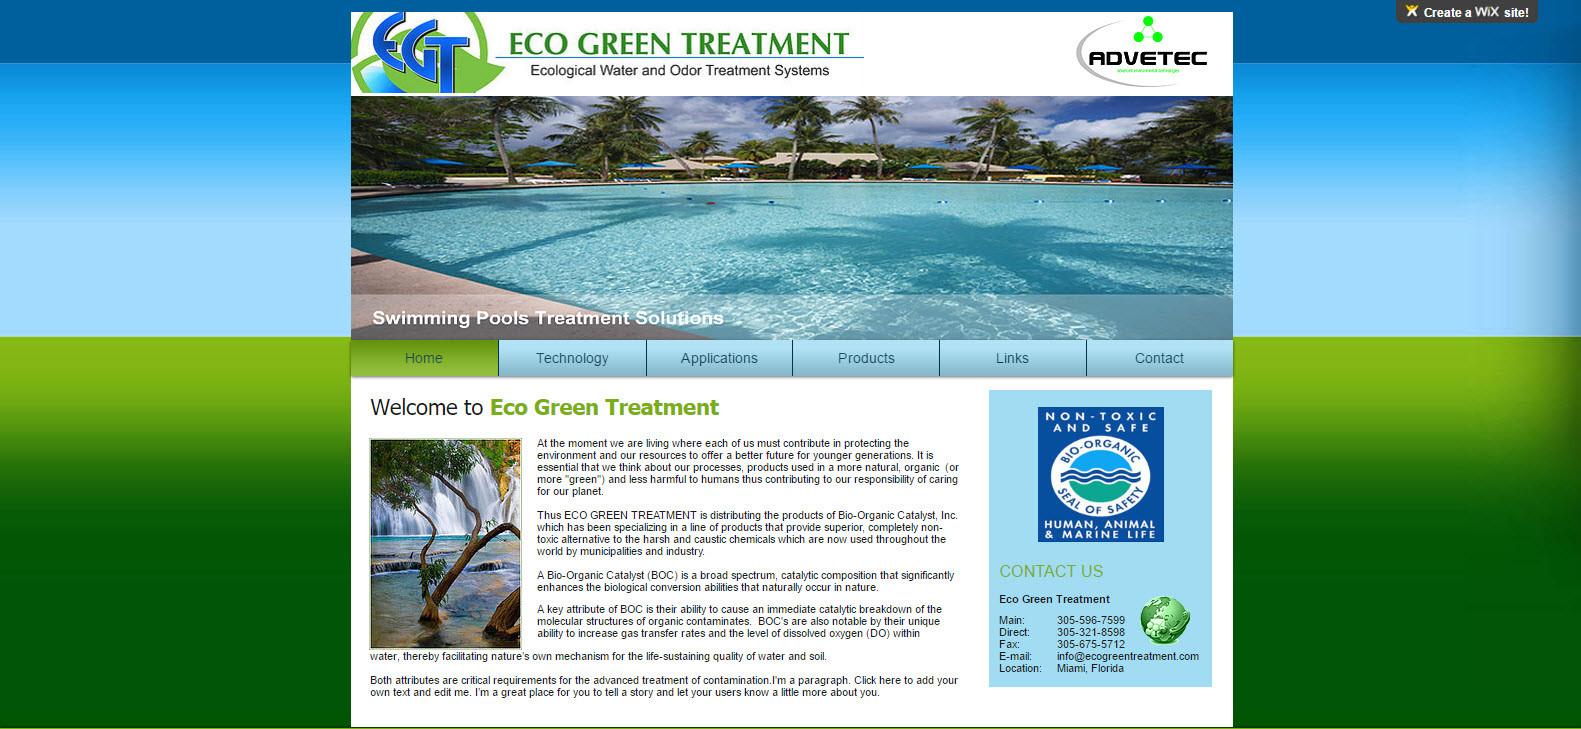 ecogreen treatment.jpg